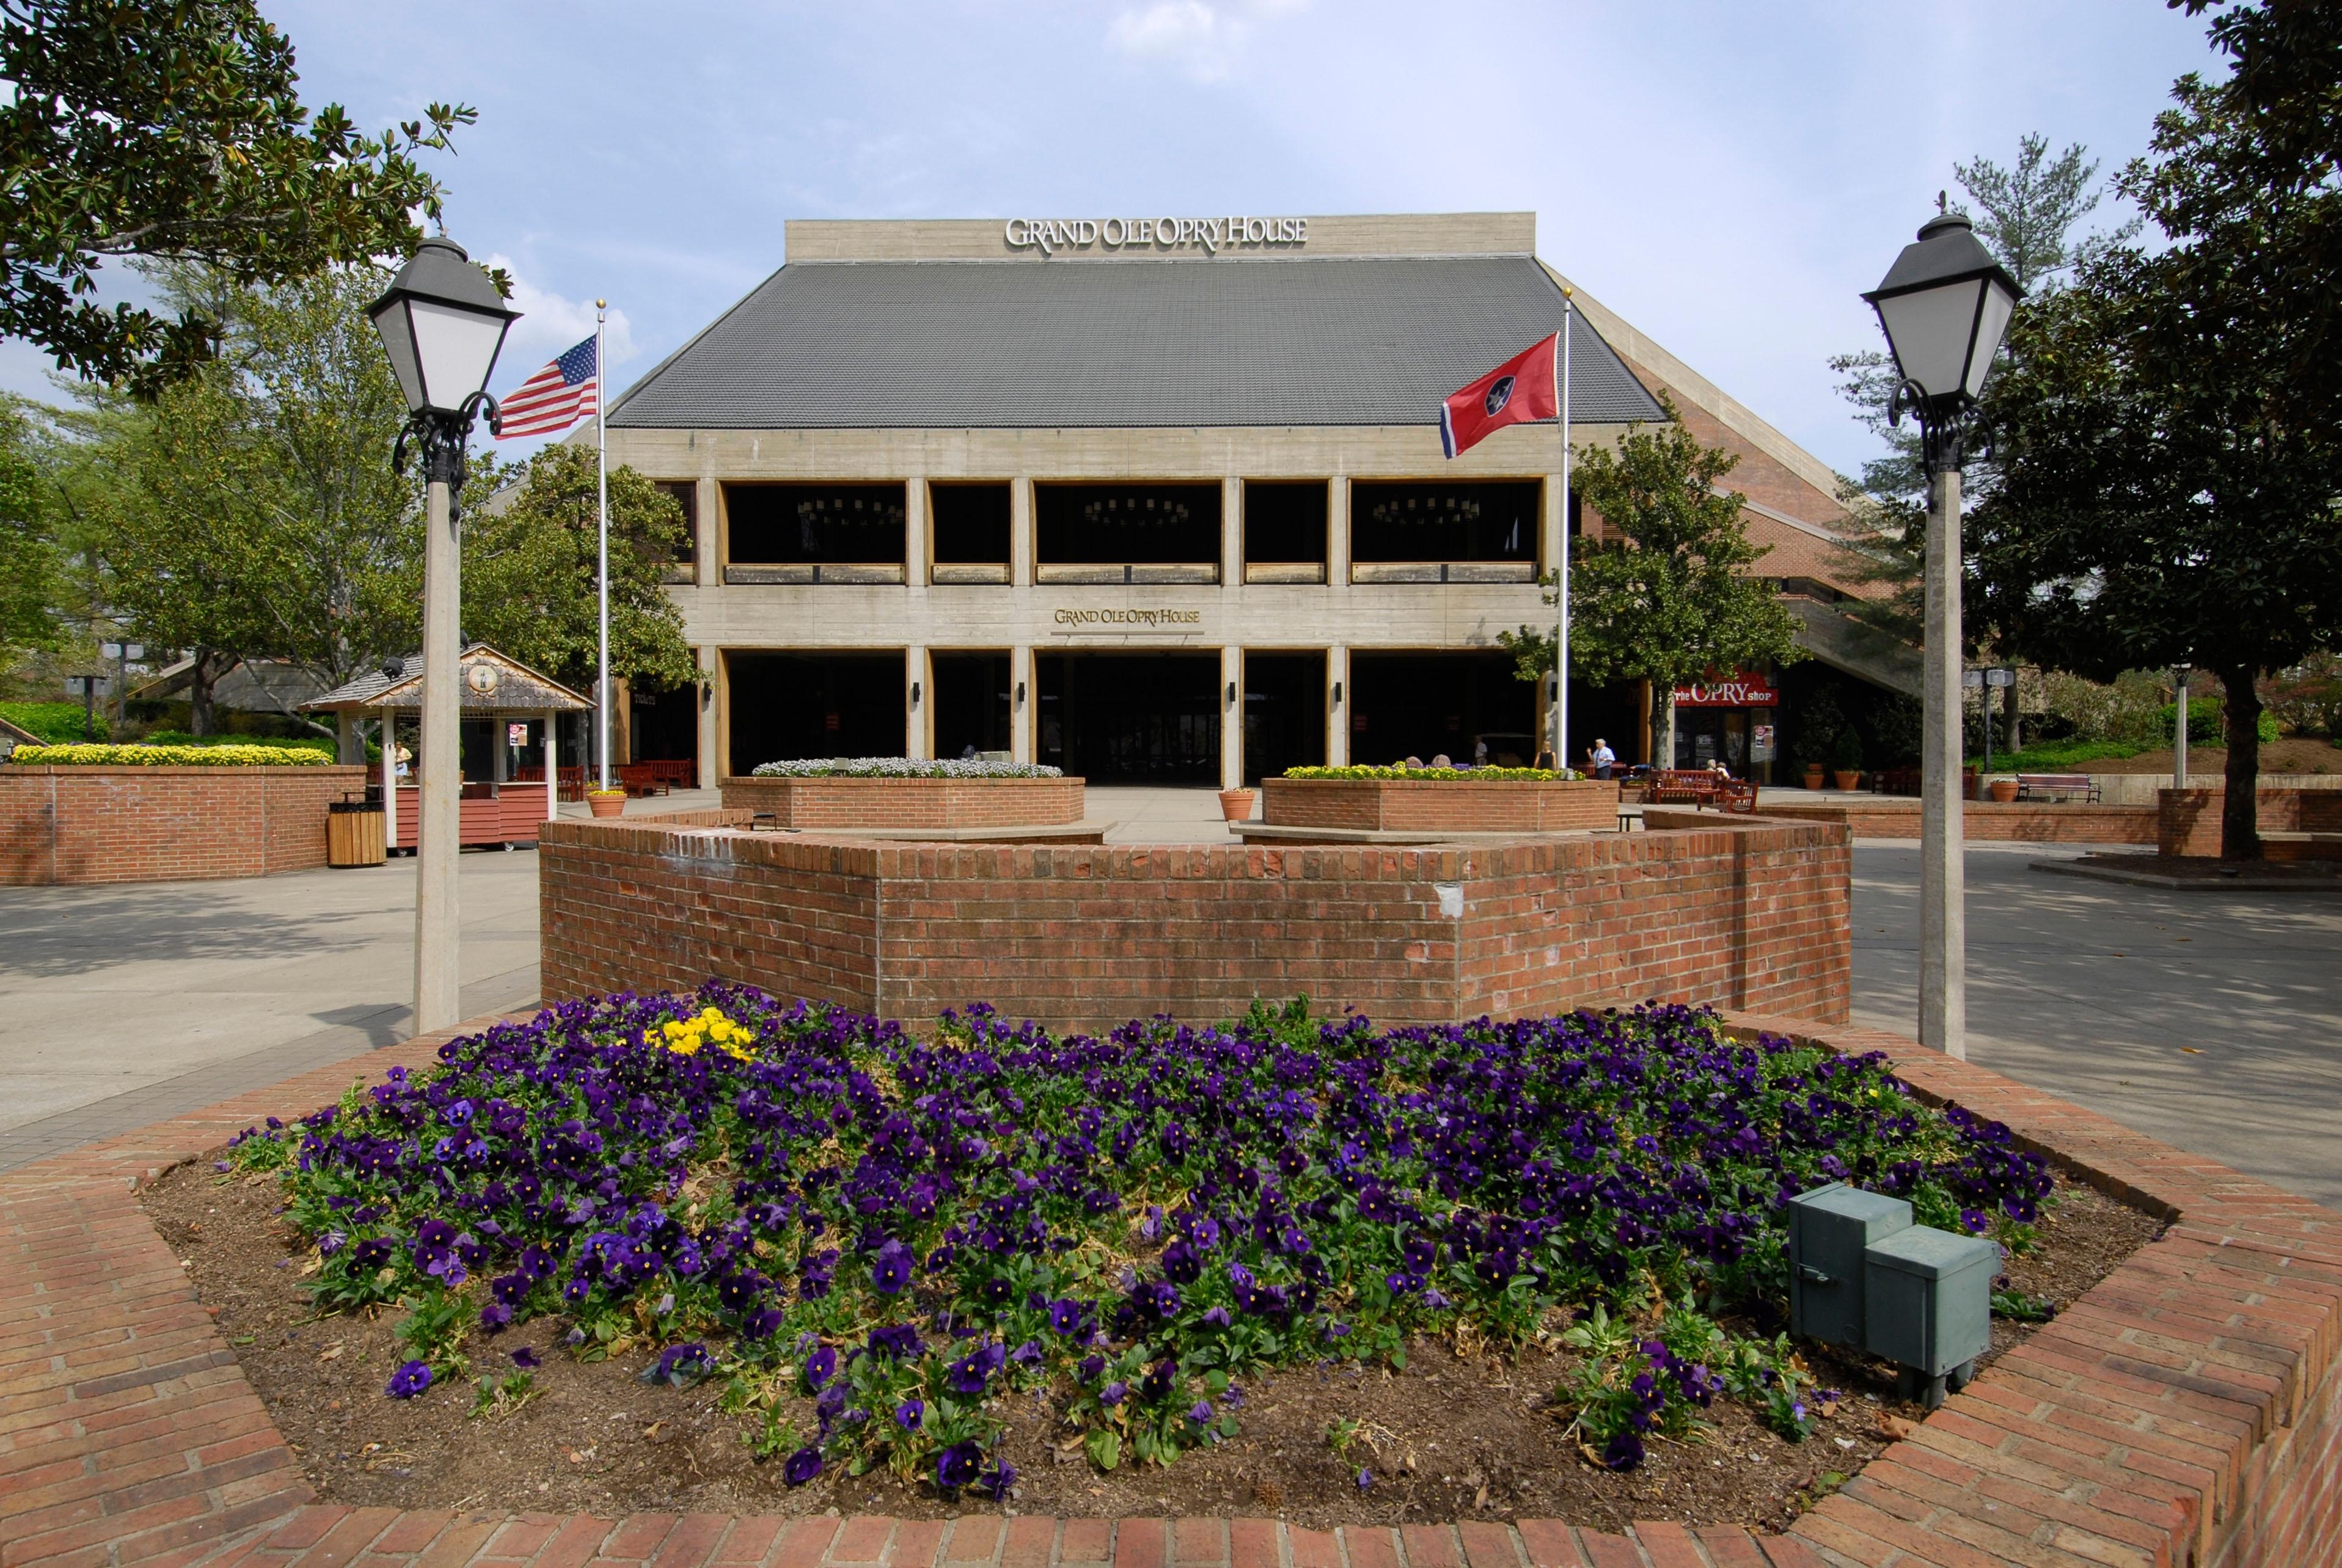 Grand Ole Opry Museum, Opryland, Tennessee, USA